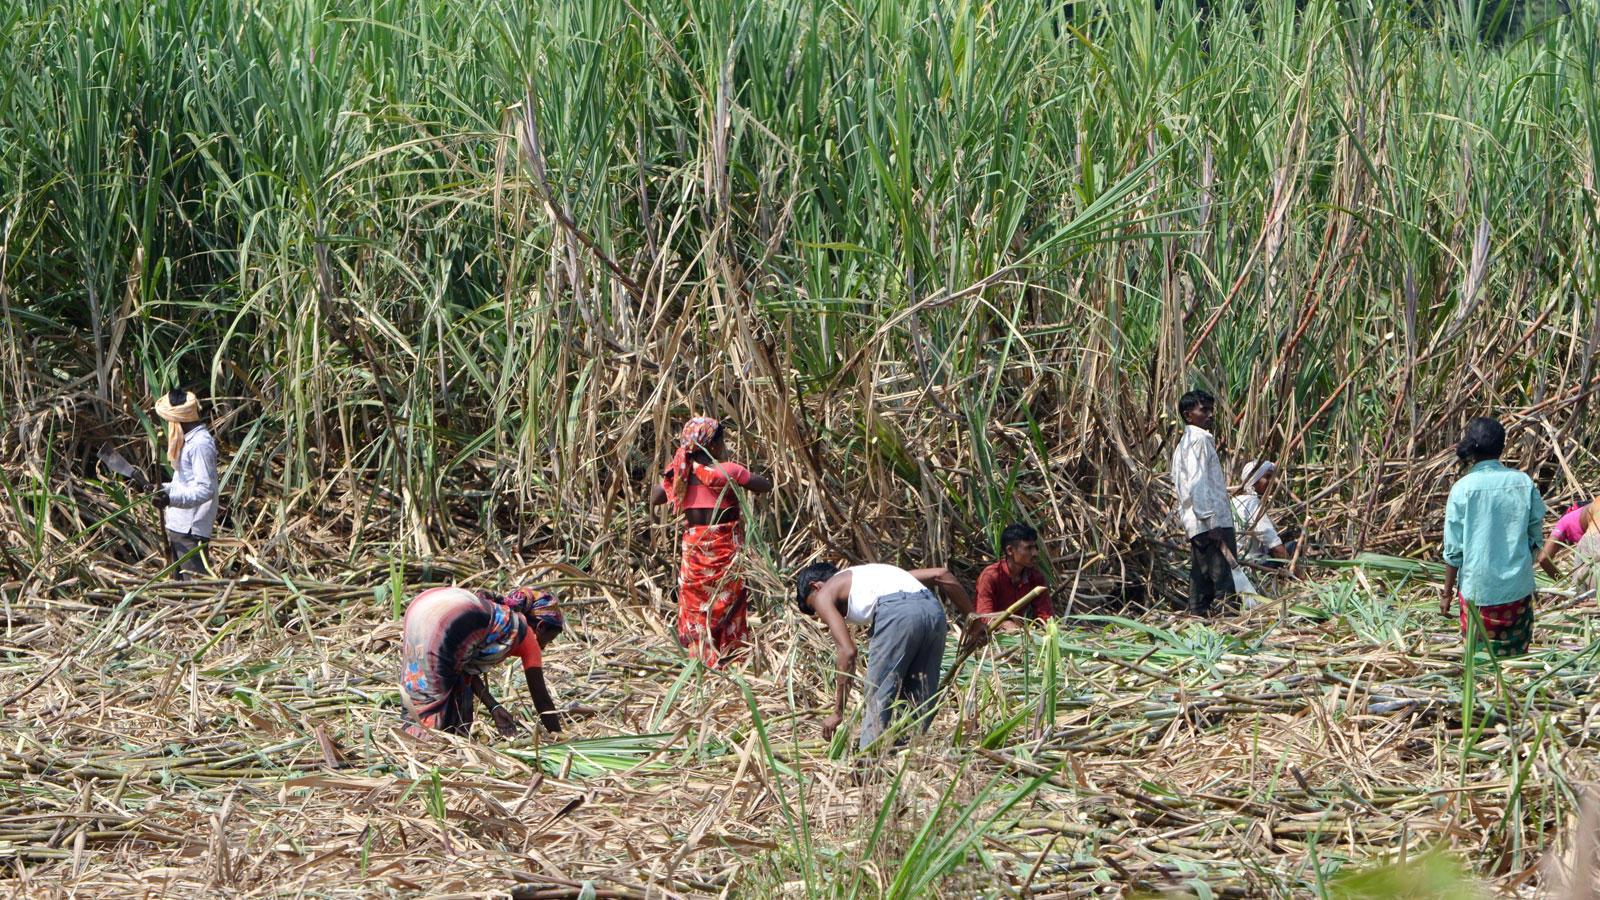 Sugarcane being harvested in Kolhapur, Maharashtra